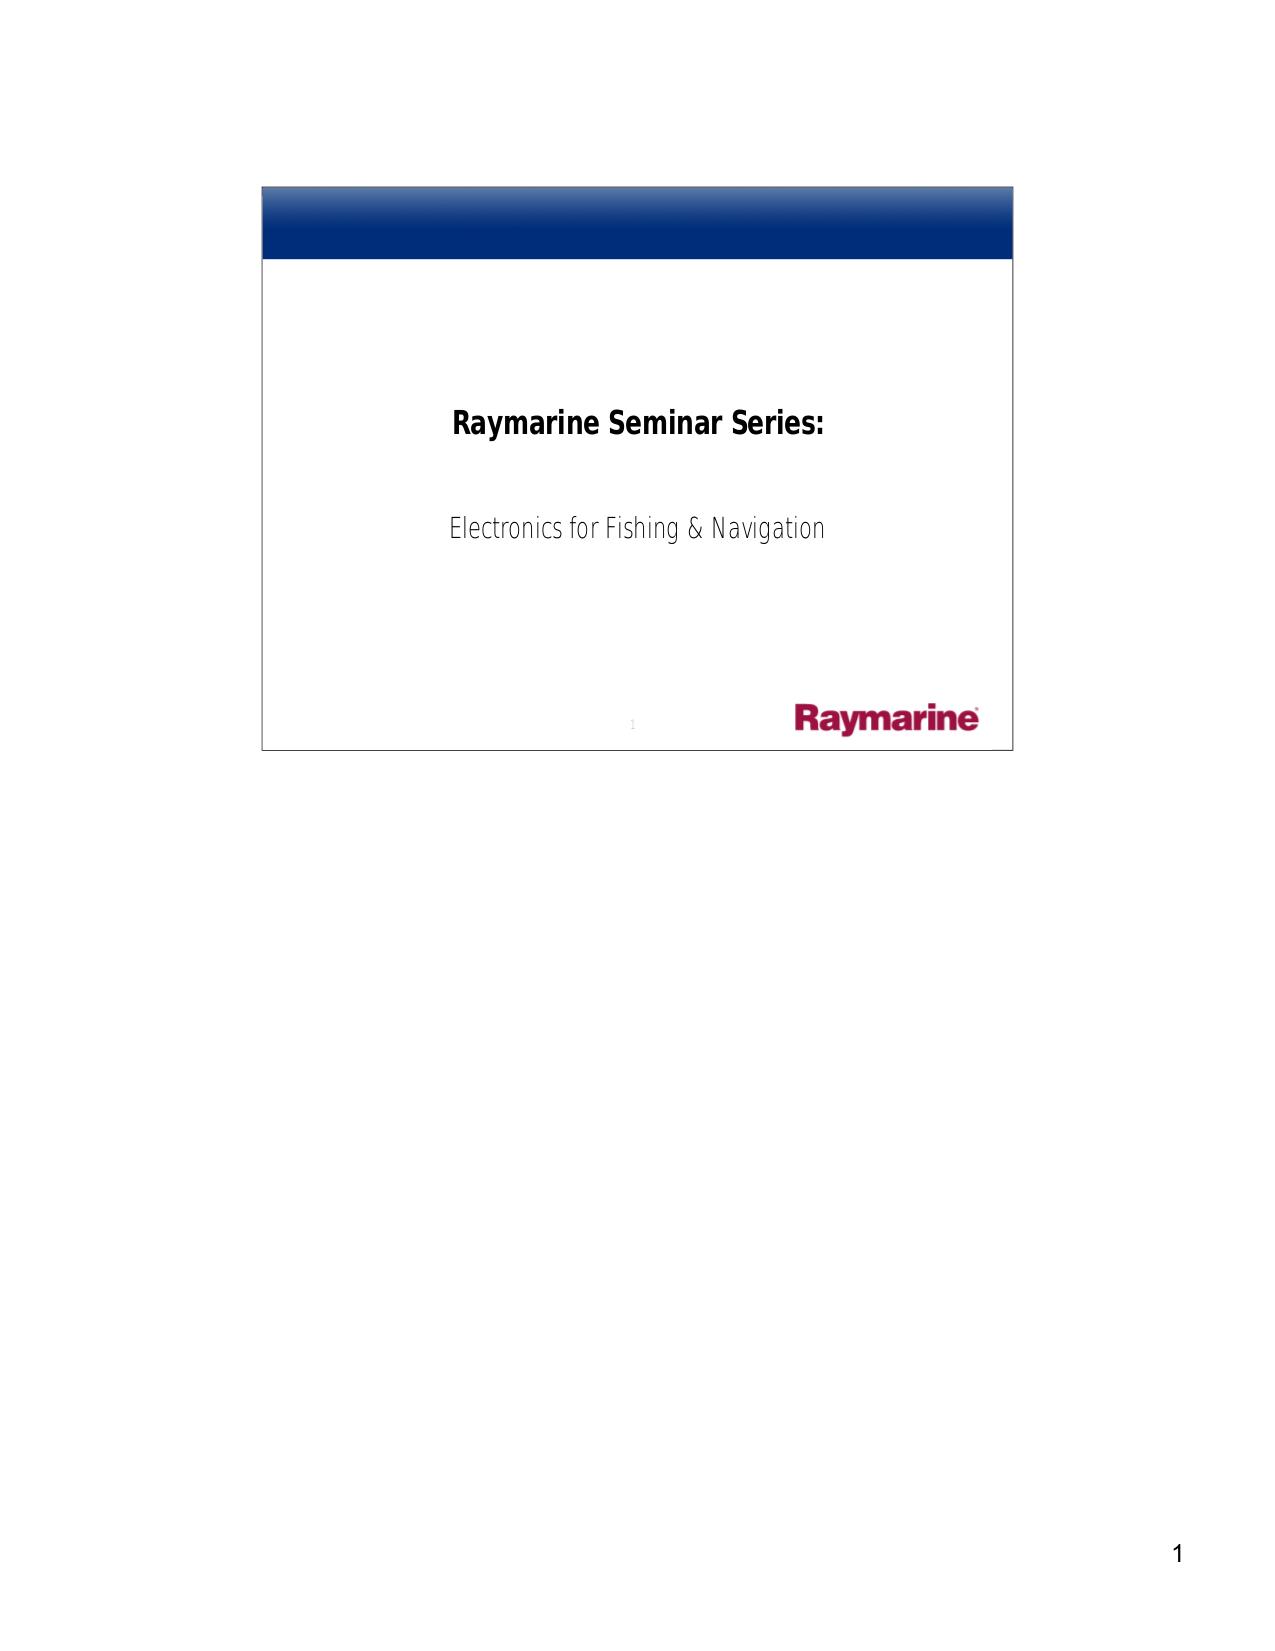 Gps seminar pdf download